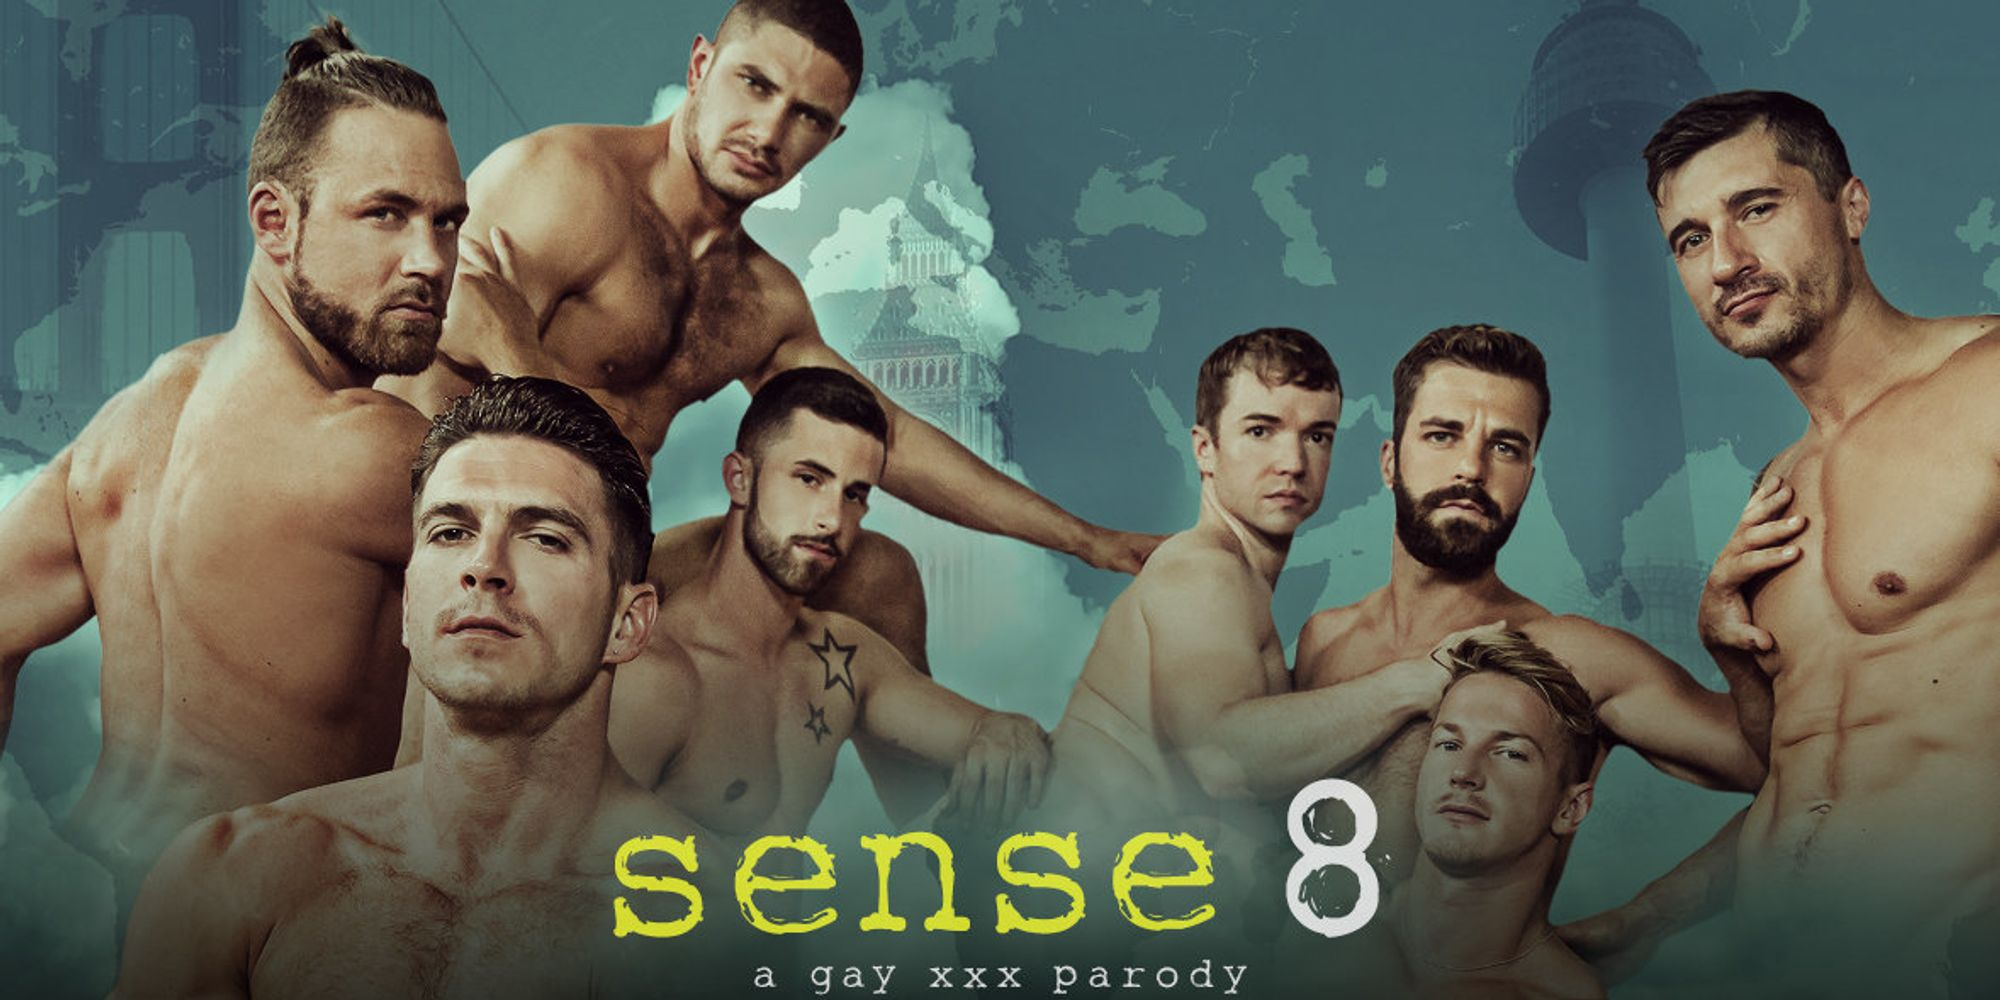 Cult TV Hit Sense8 Just Got A Gay XXX Makeover | The